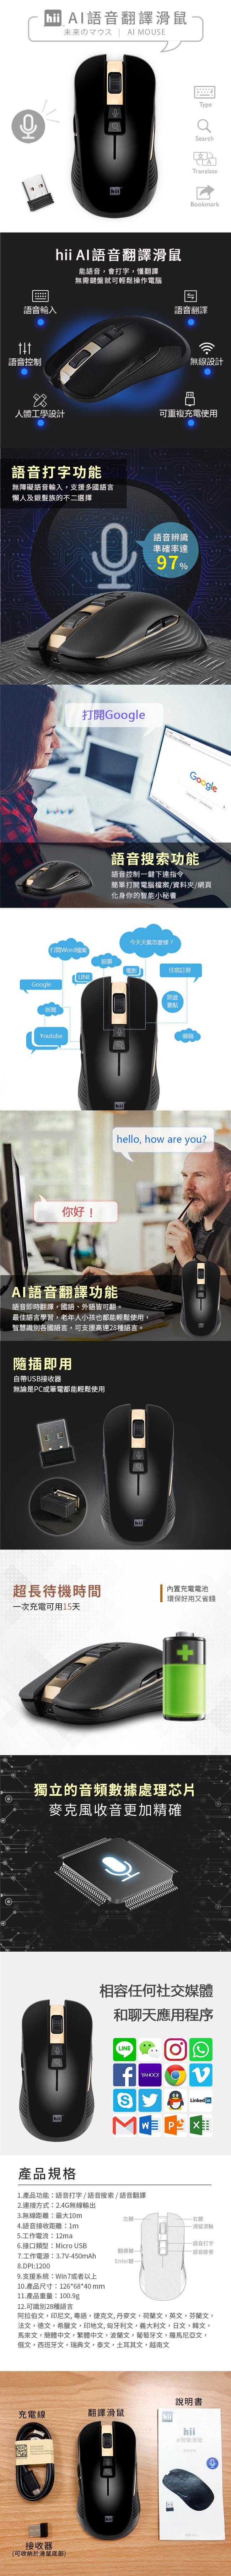 hii |AI語音翻譯智能滑鼠